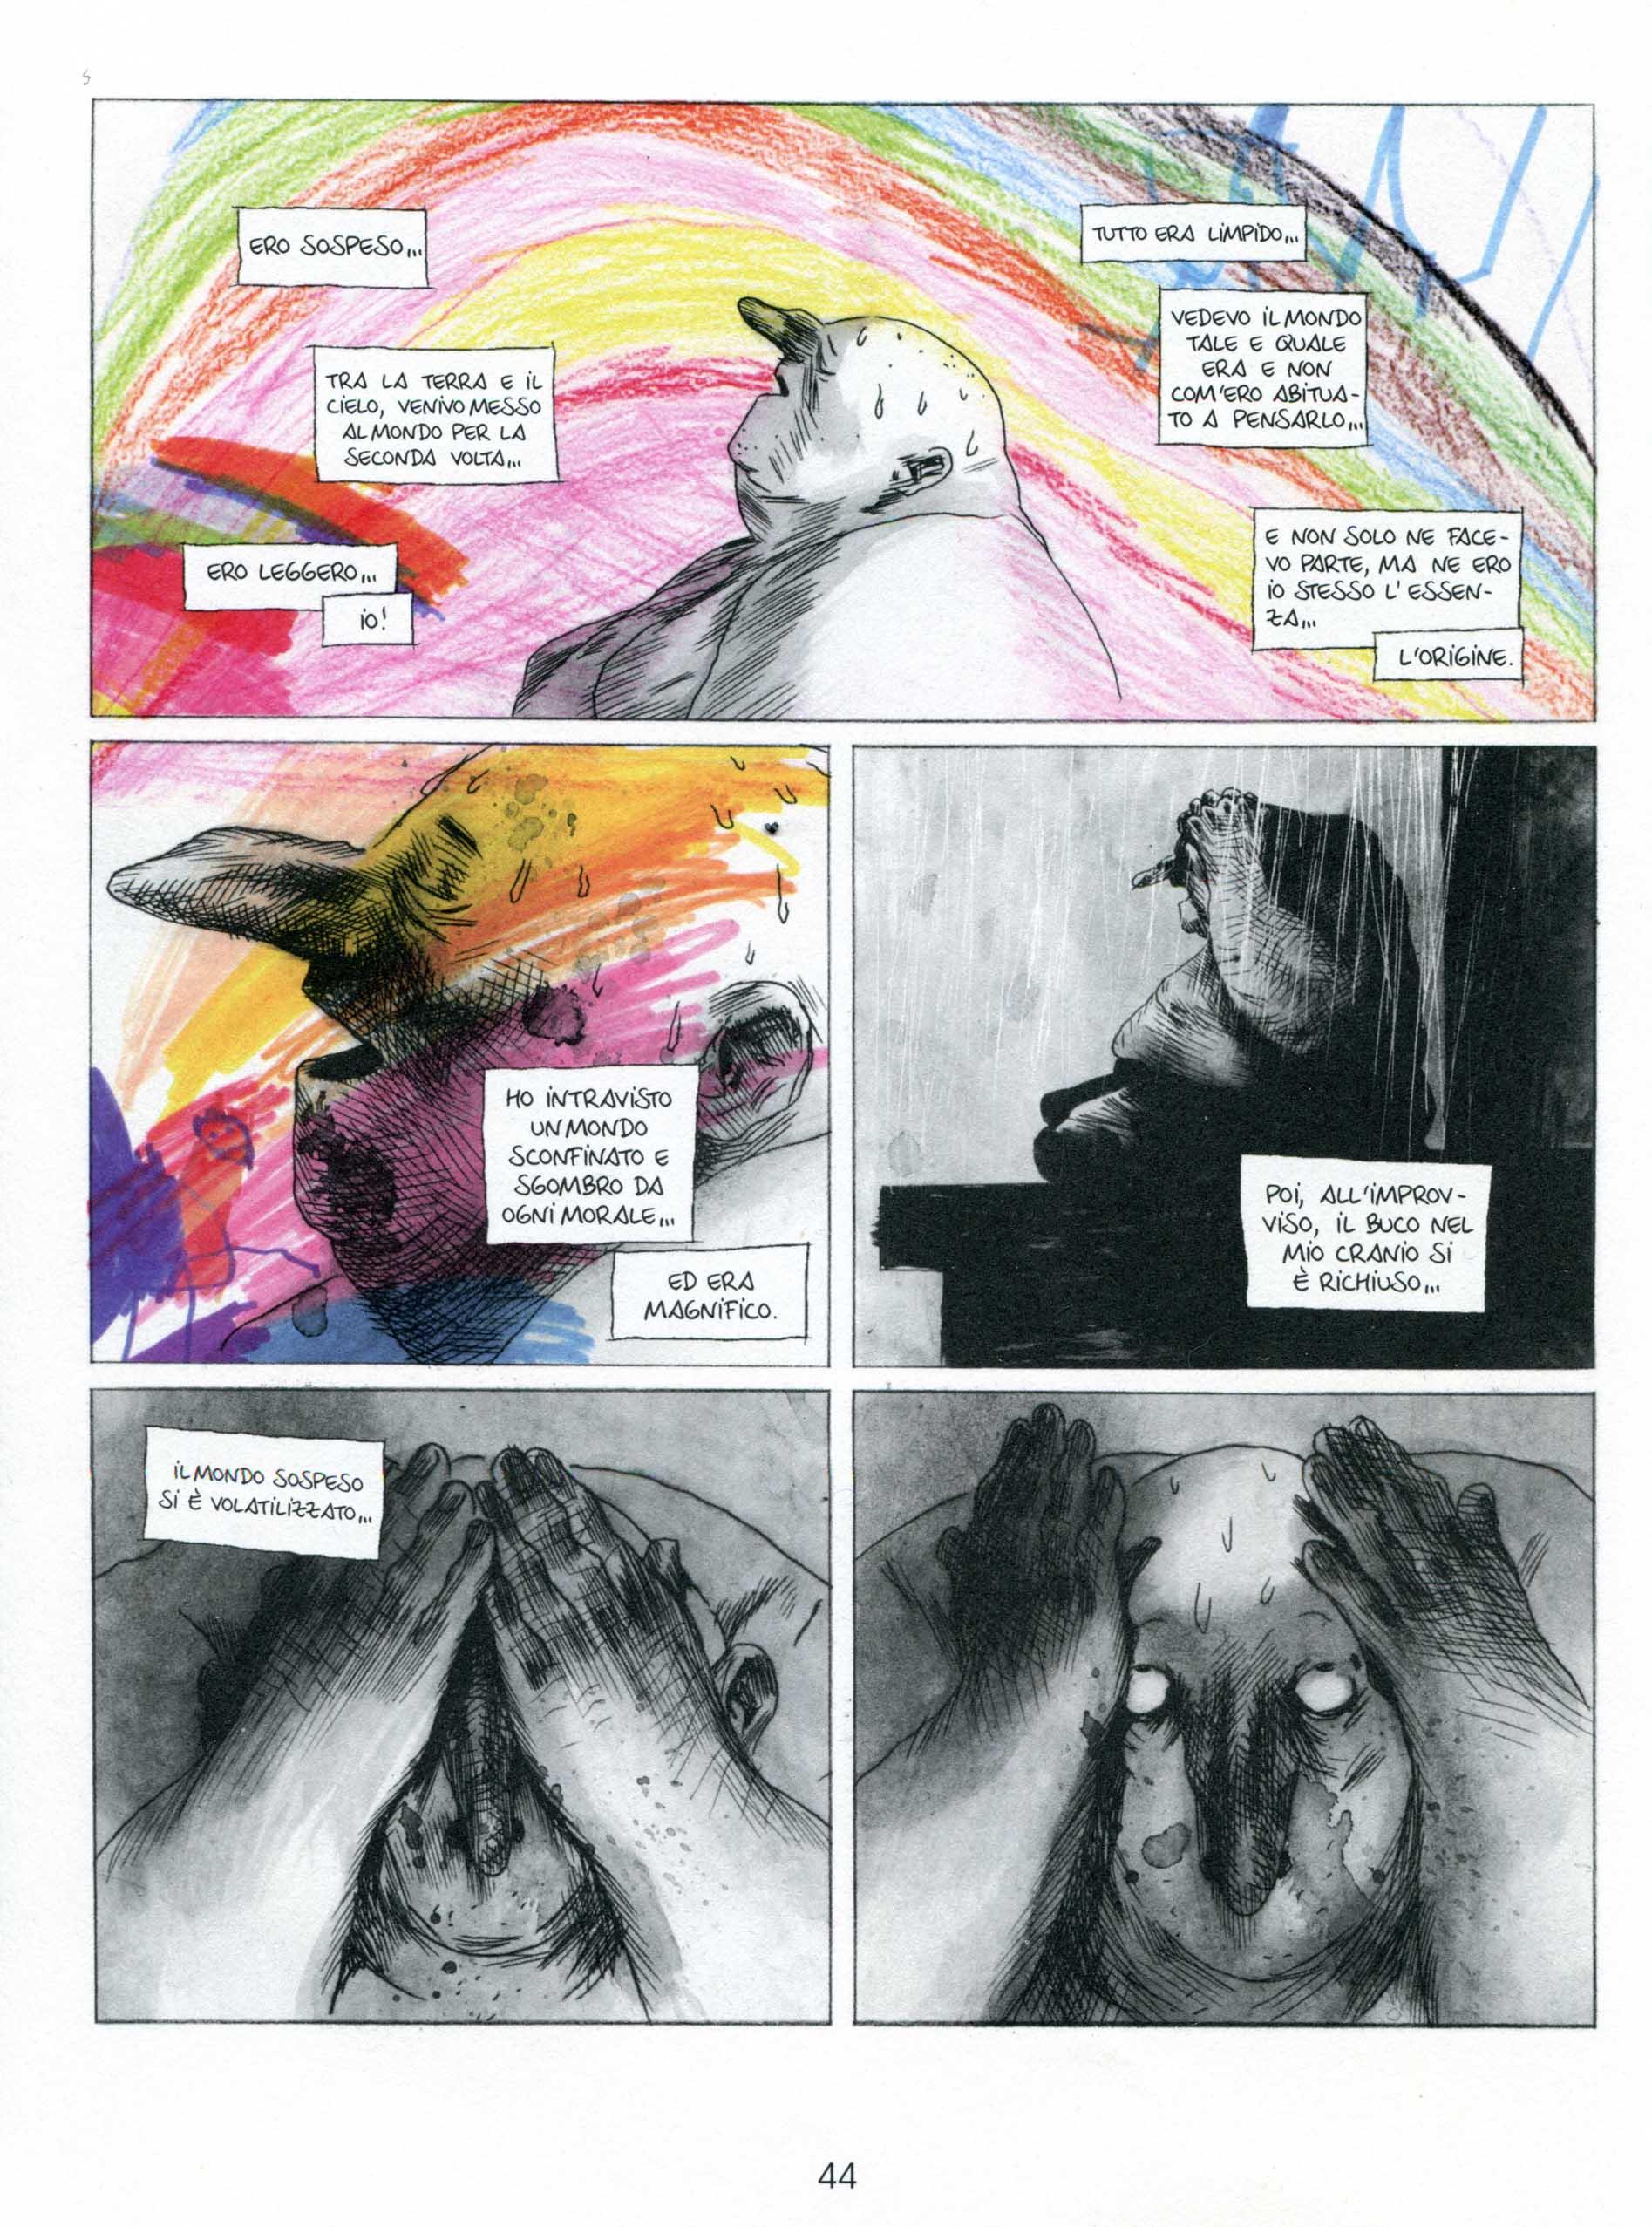 Manu Larcenet, Blast 1, pagina 44